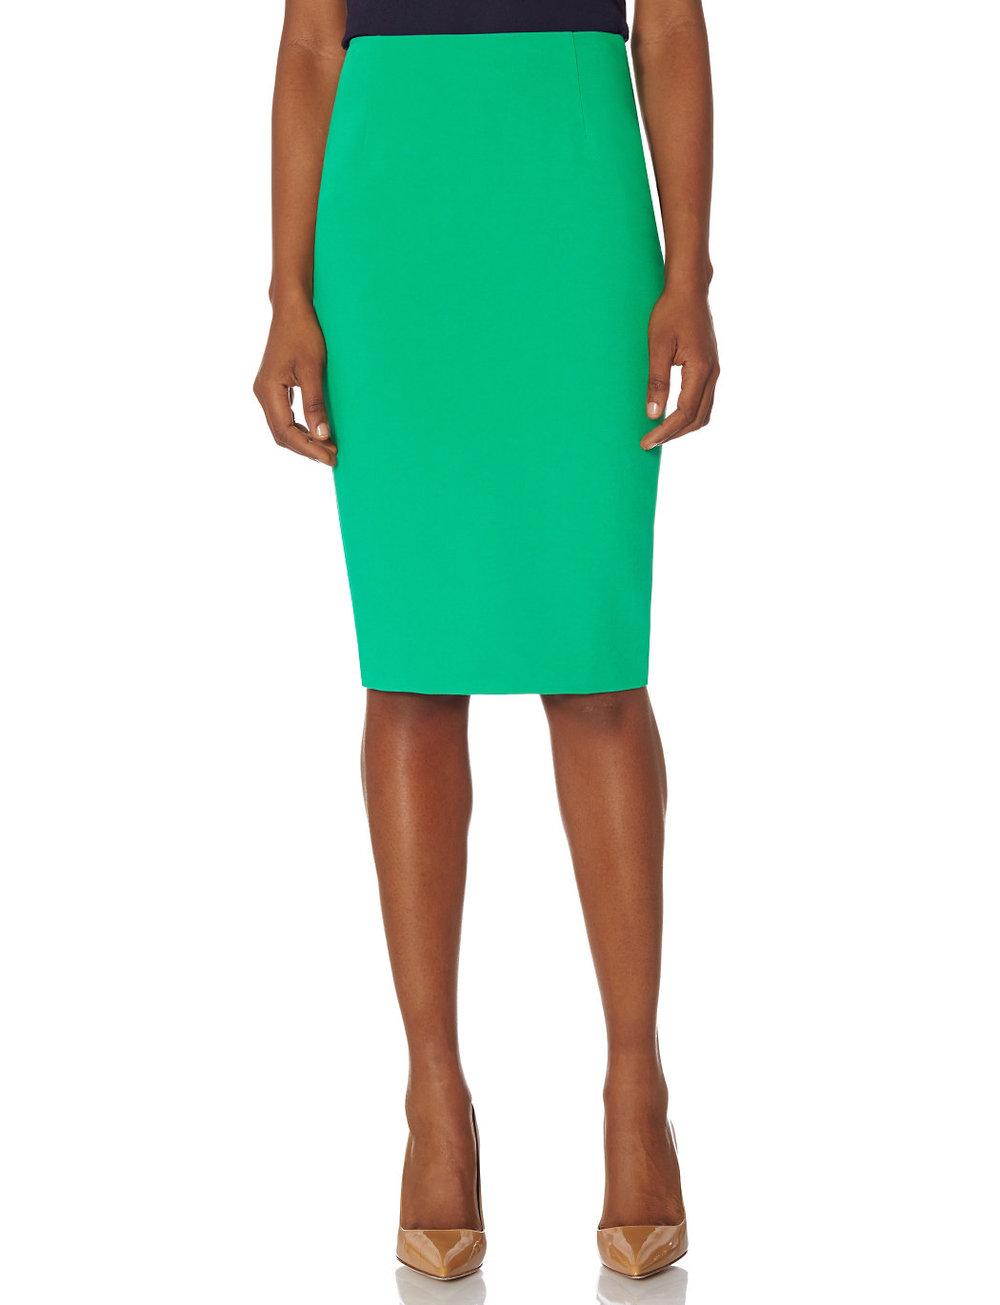 High Waist Pencil Skirt. the Limited. $69.95.